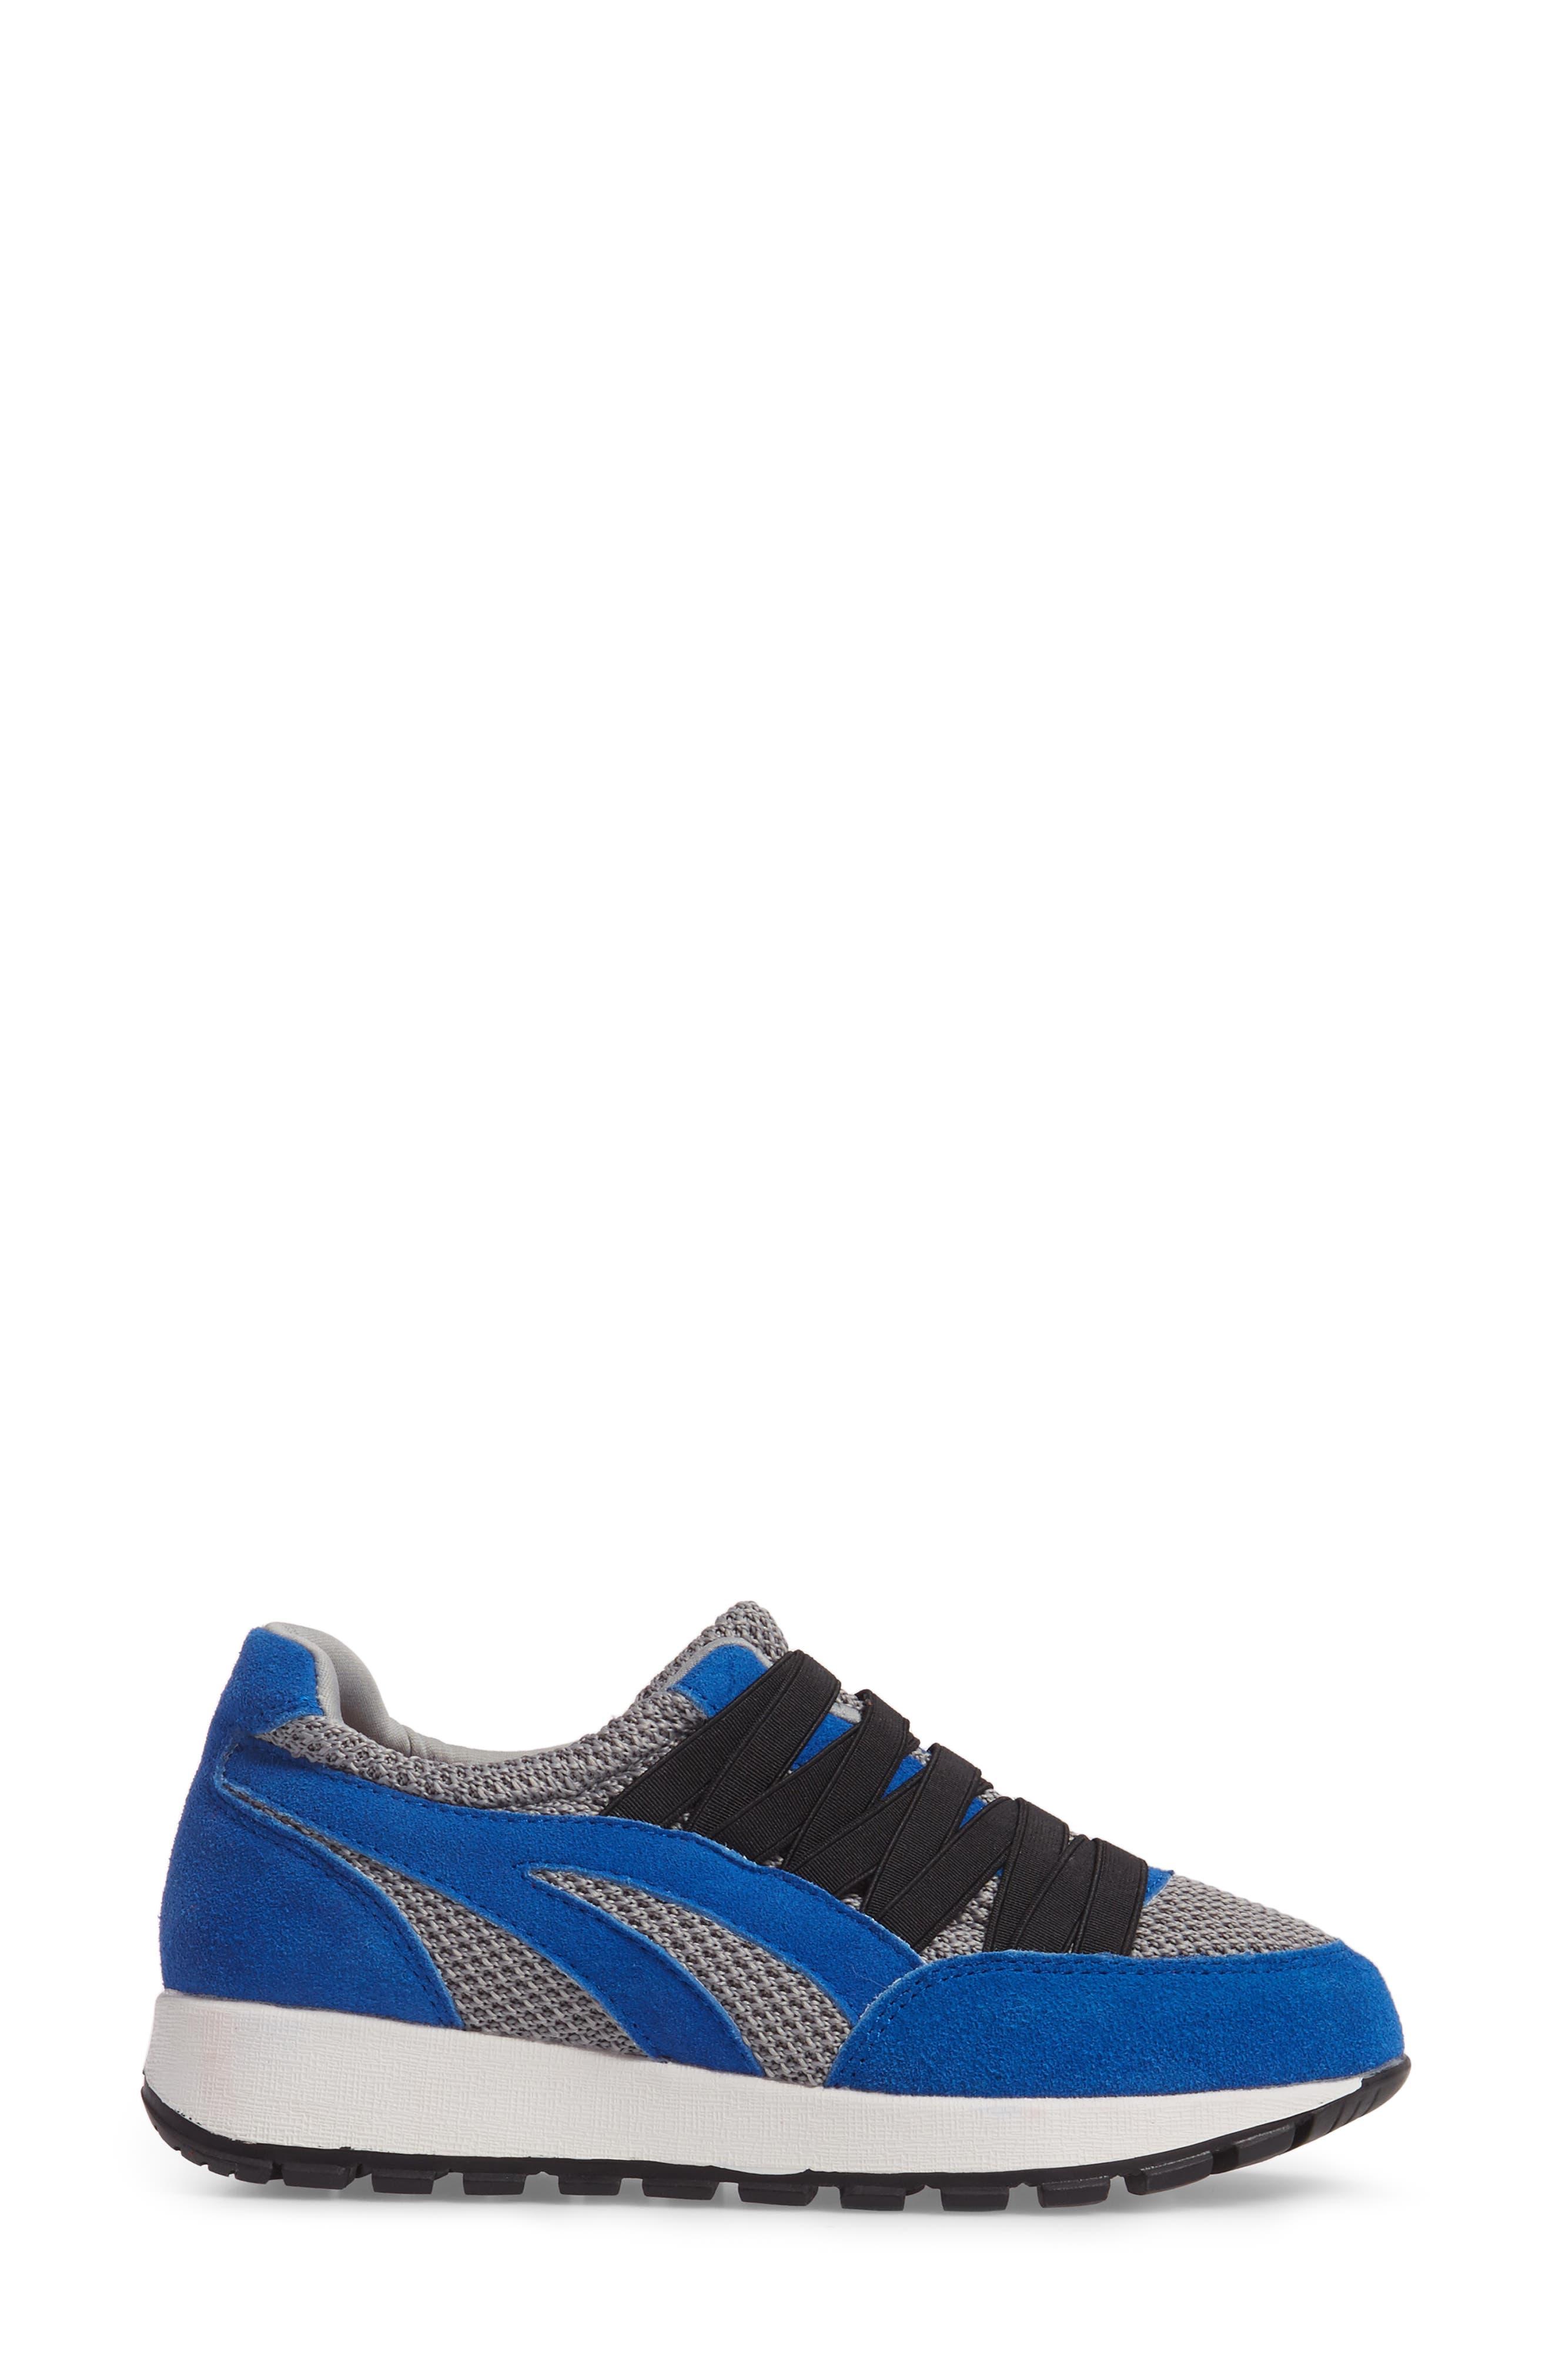 BERNIE MEV., Bernie Mev Tara Cano Sneaker, Alternate thumbnail 3, color, ROYAL BLUE/ GREY FABRIC